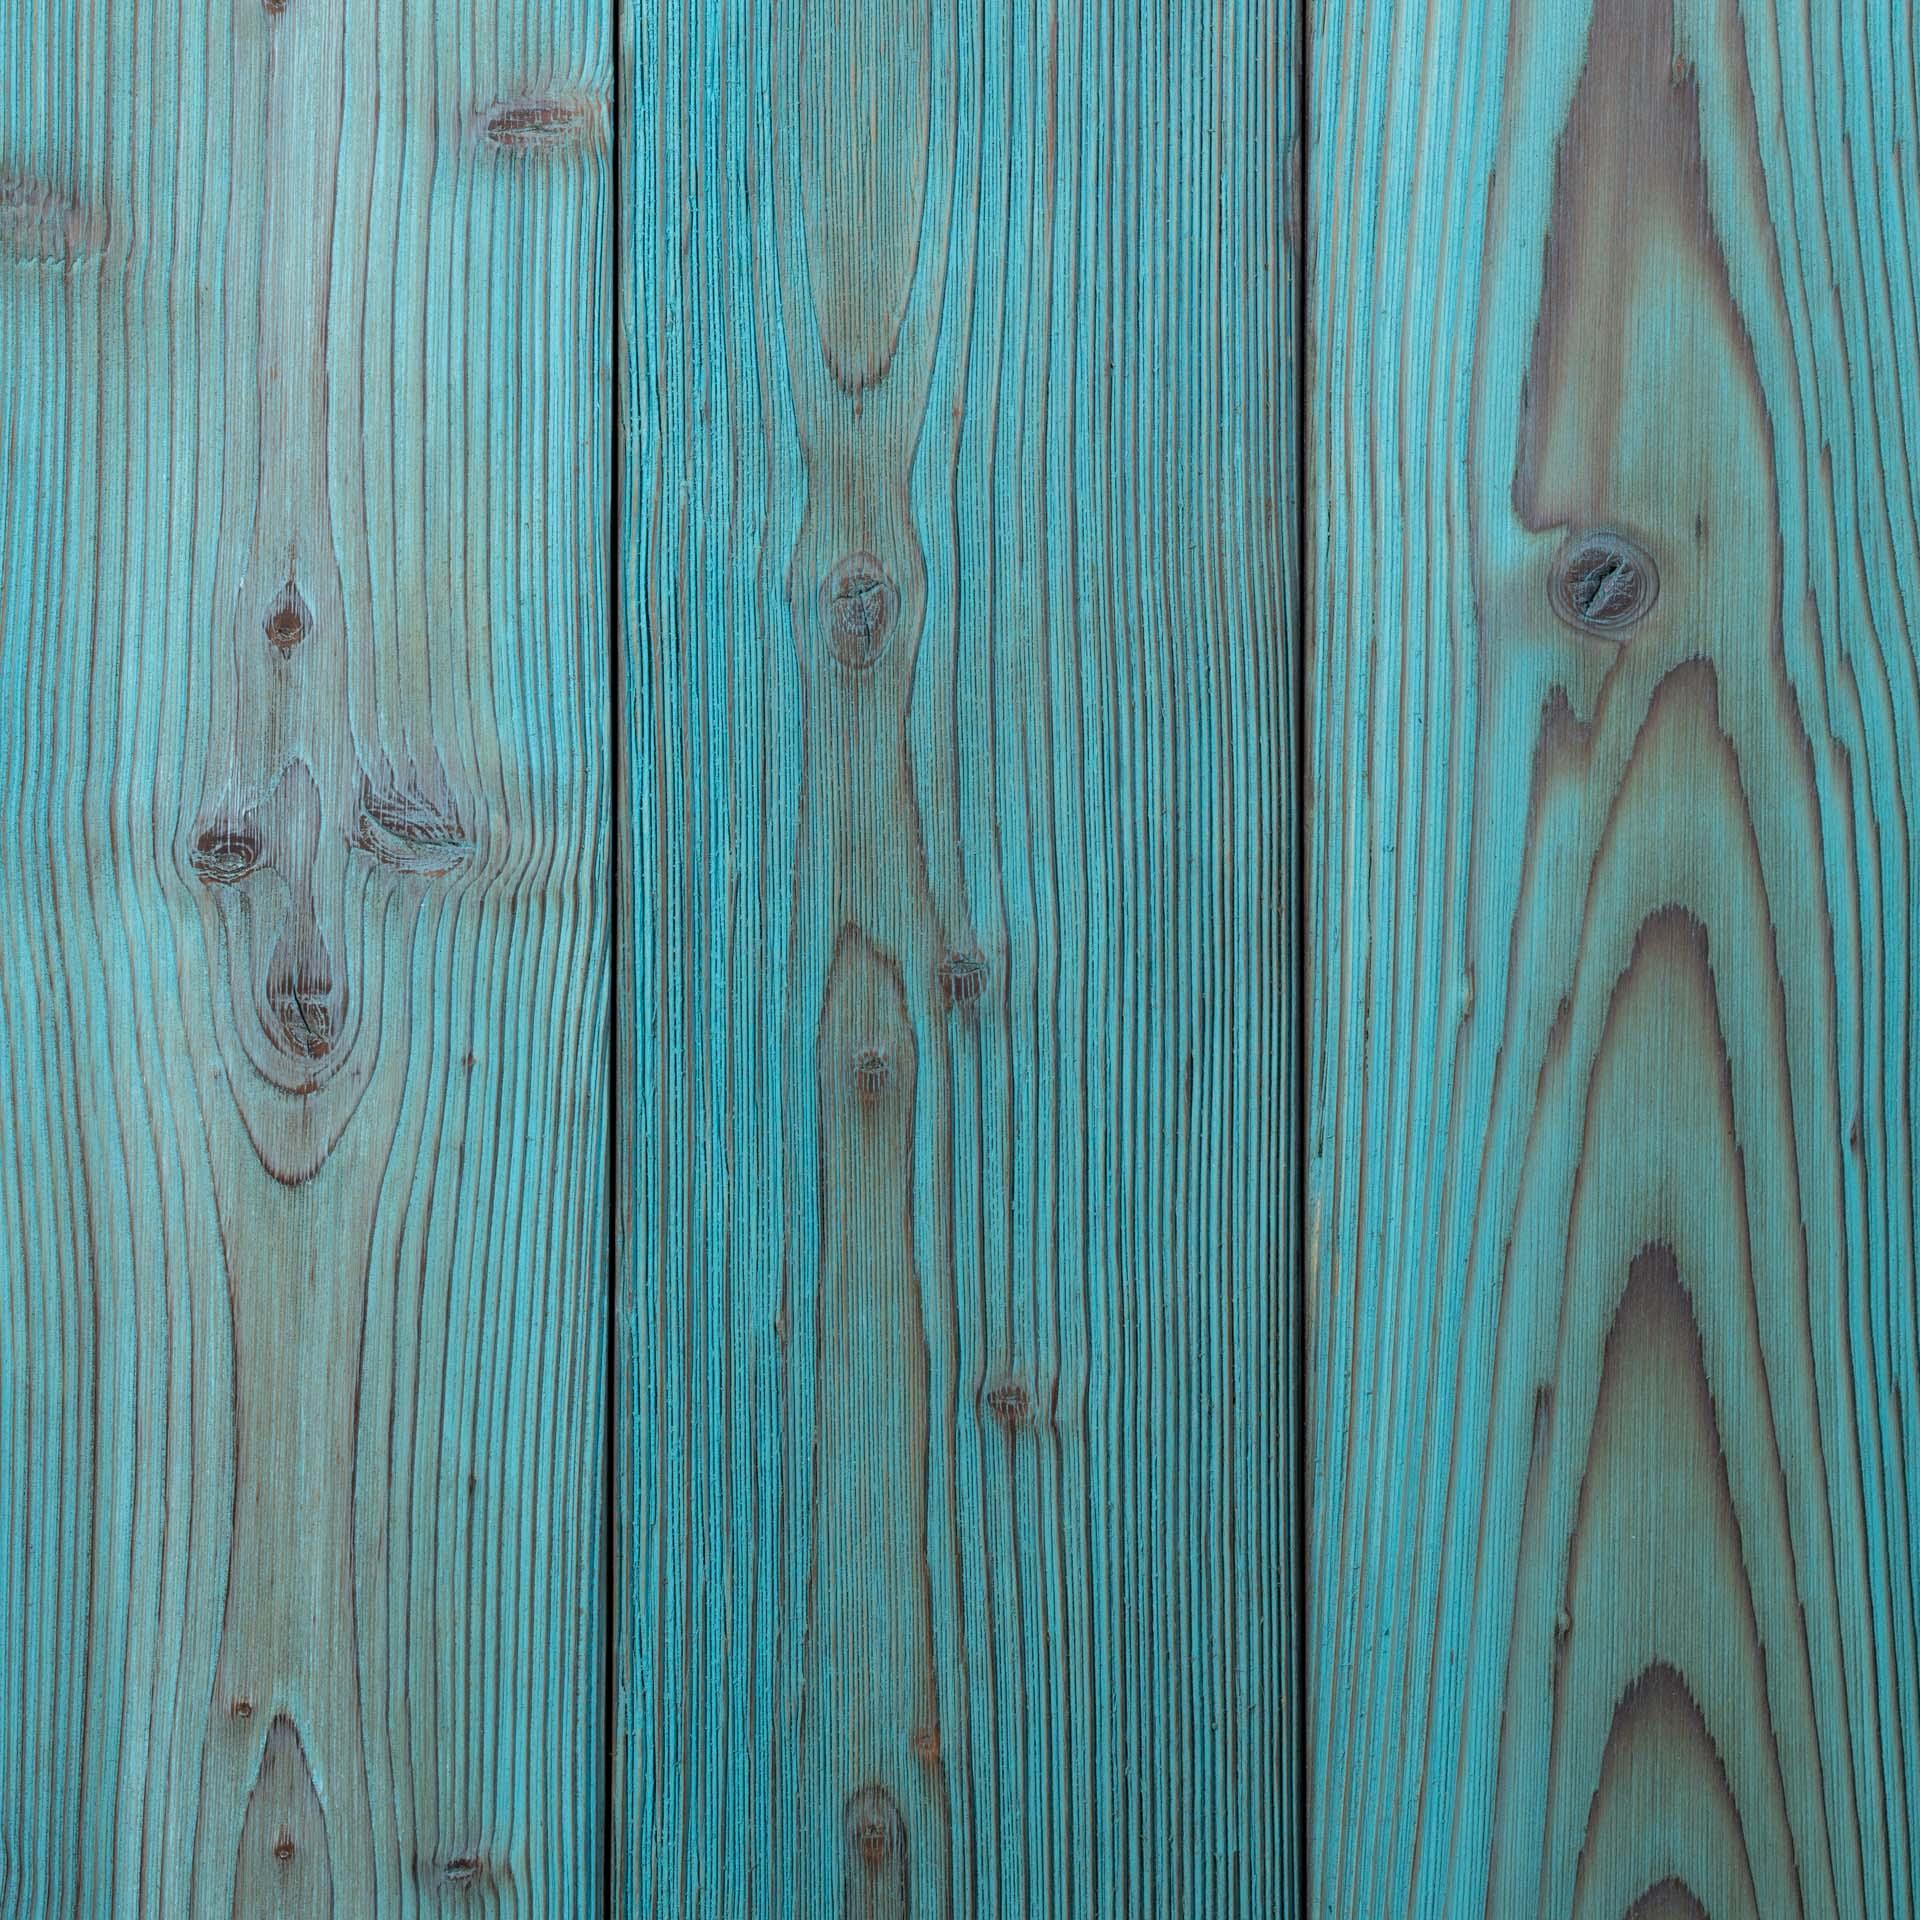 Polūkai <br>(Northwestern Spruce)